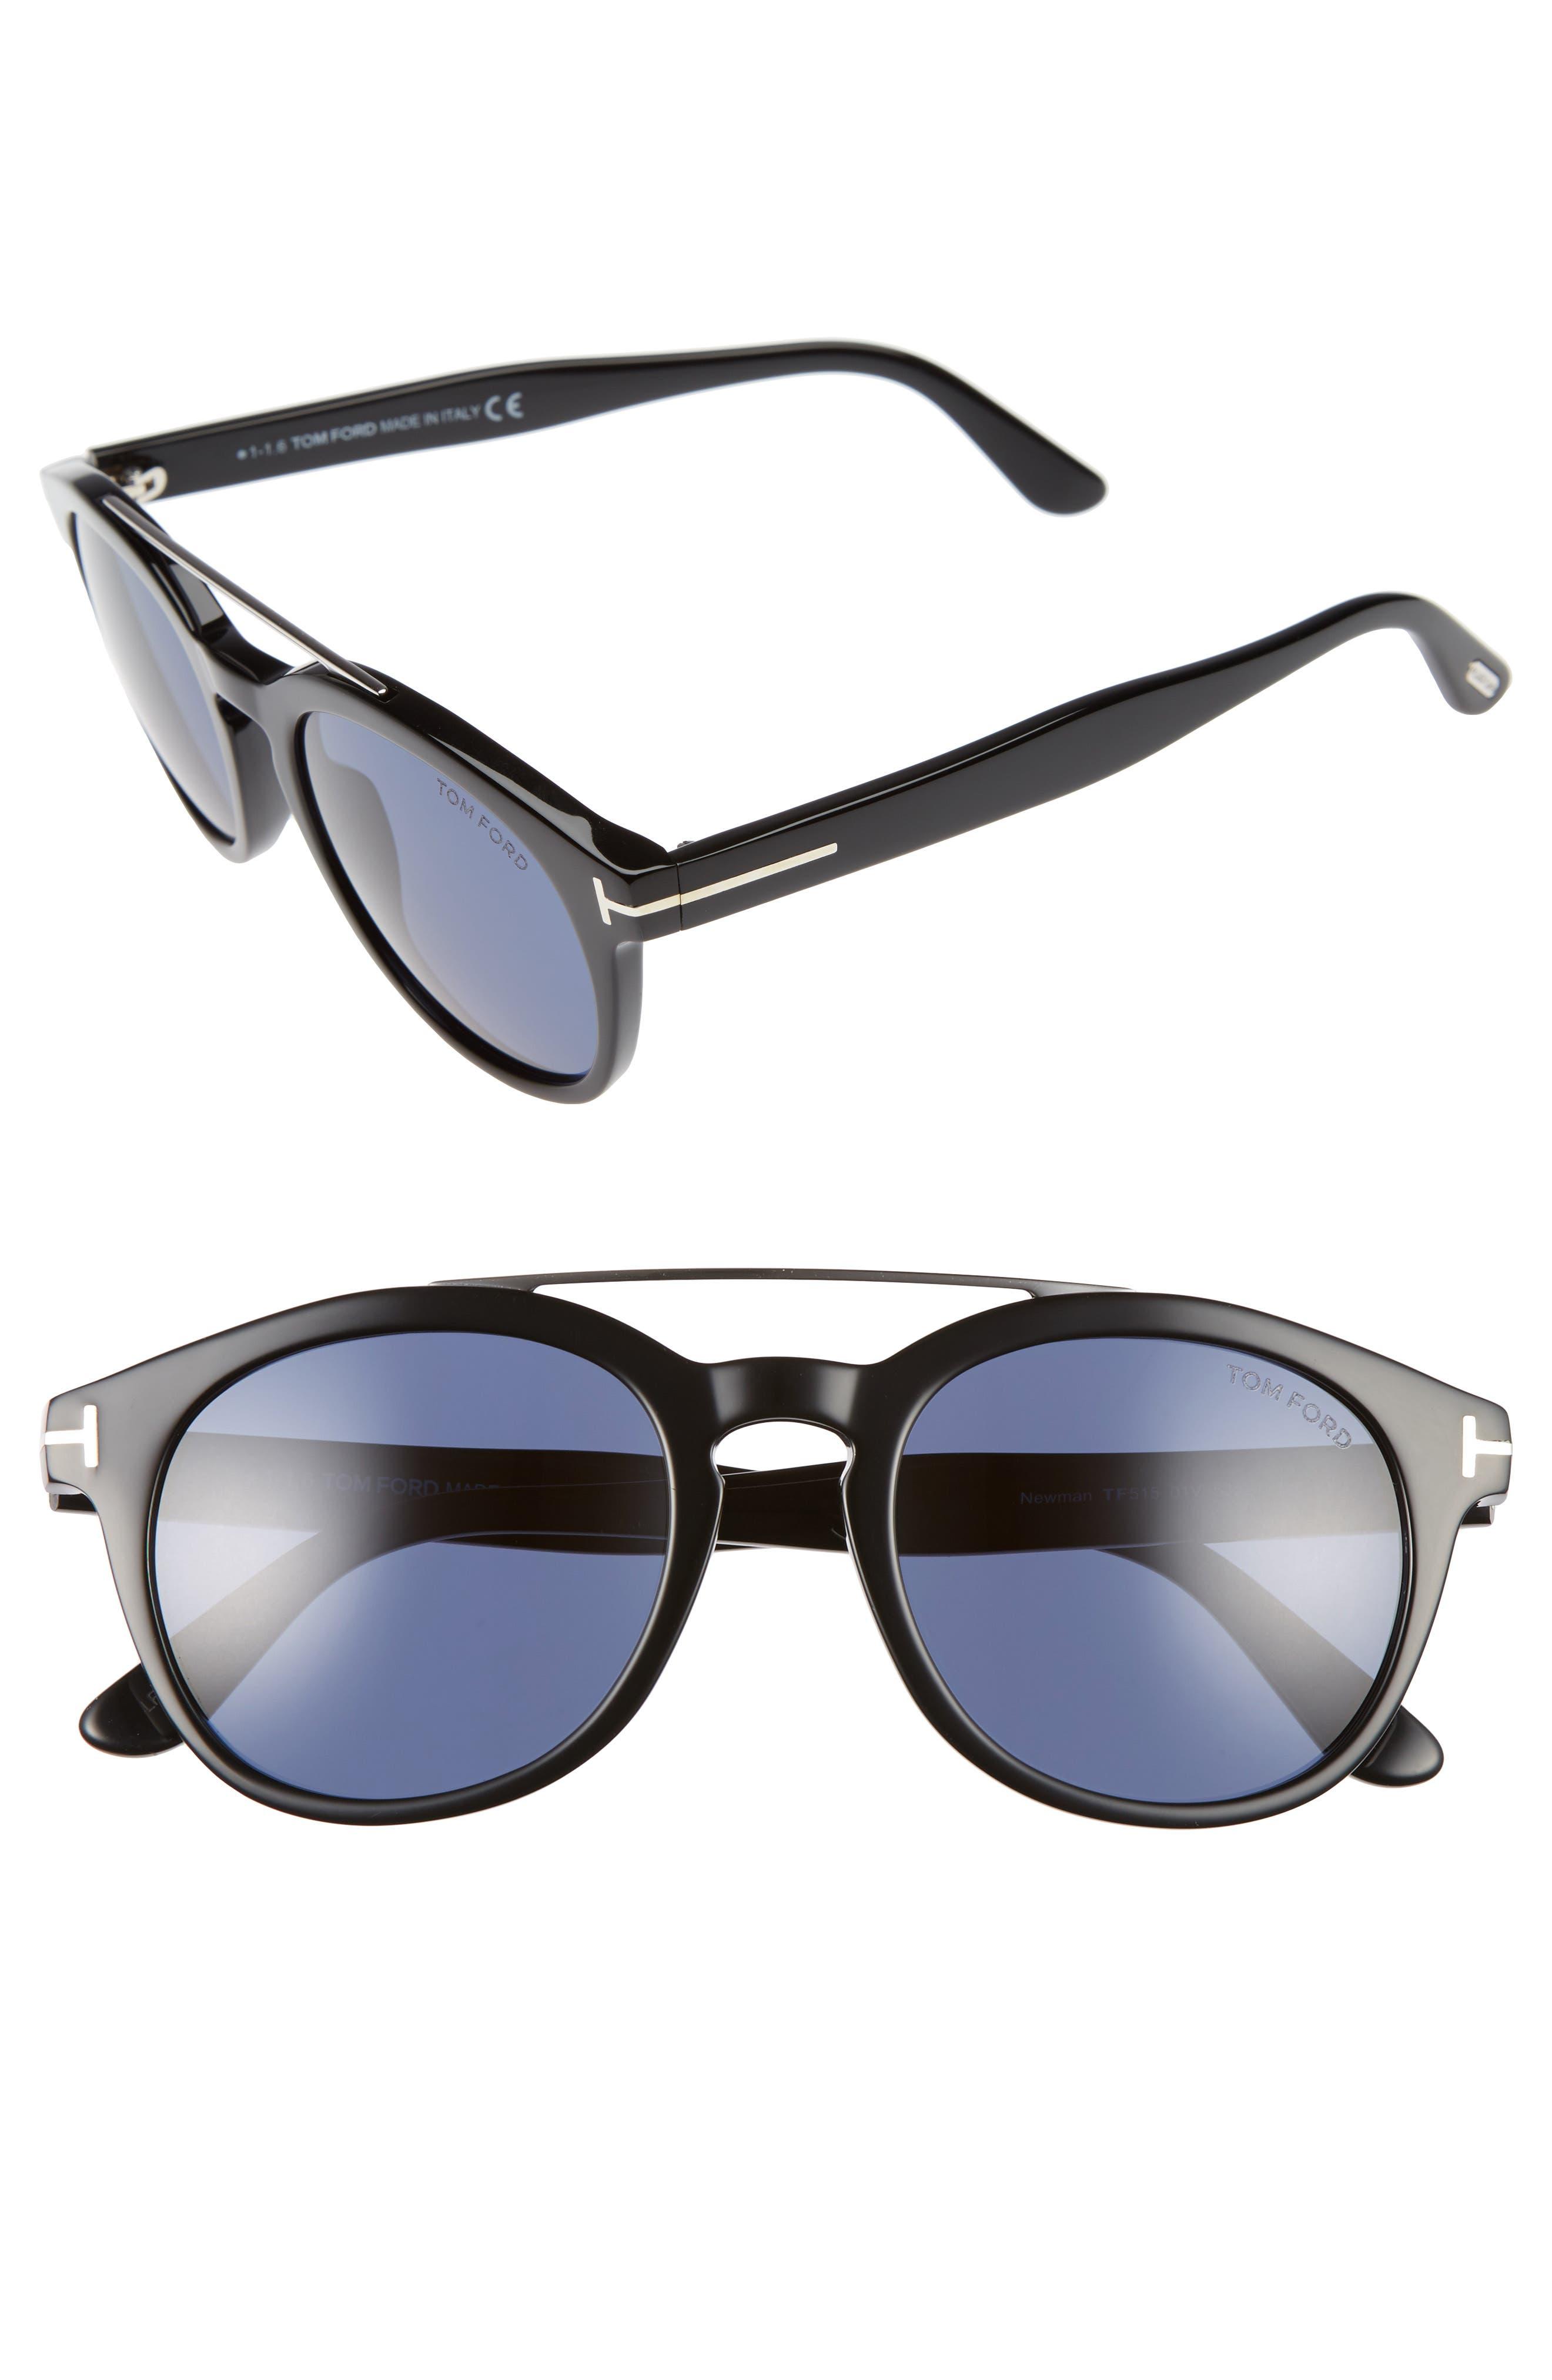 Newman 53mm Sunglasses,                         Main,                         color, 001